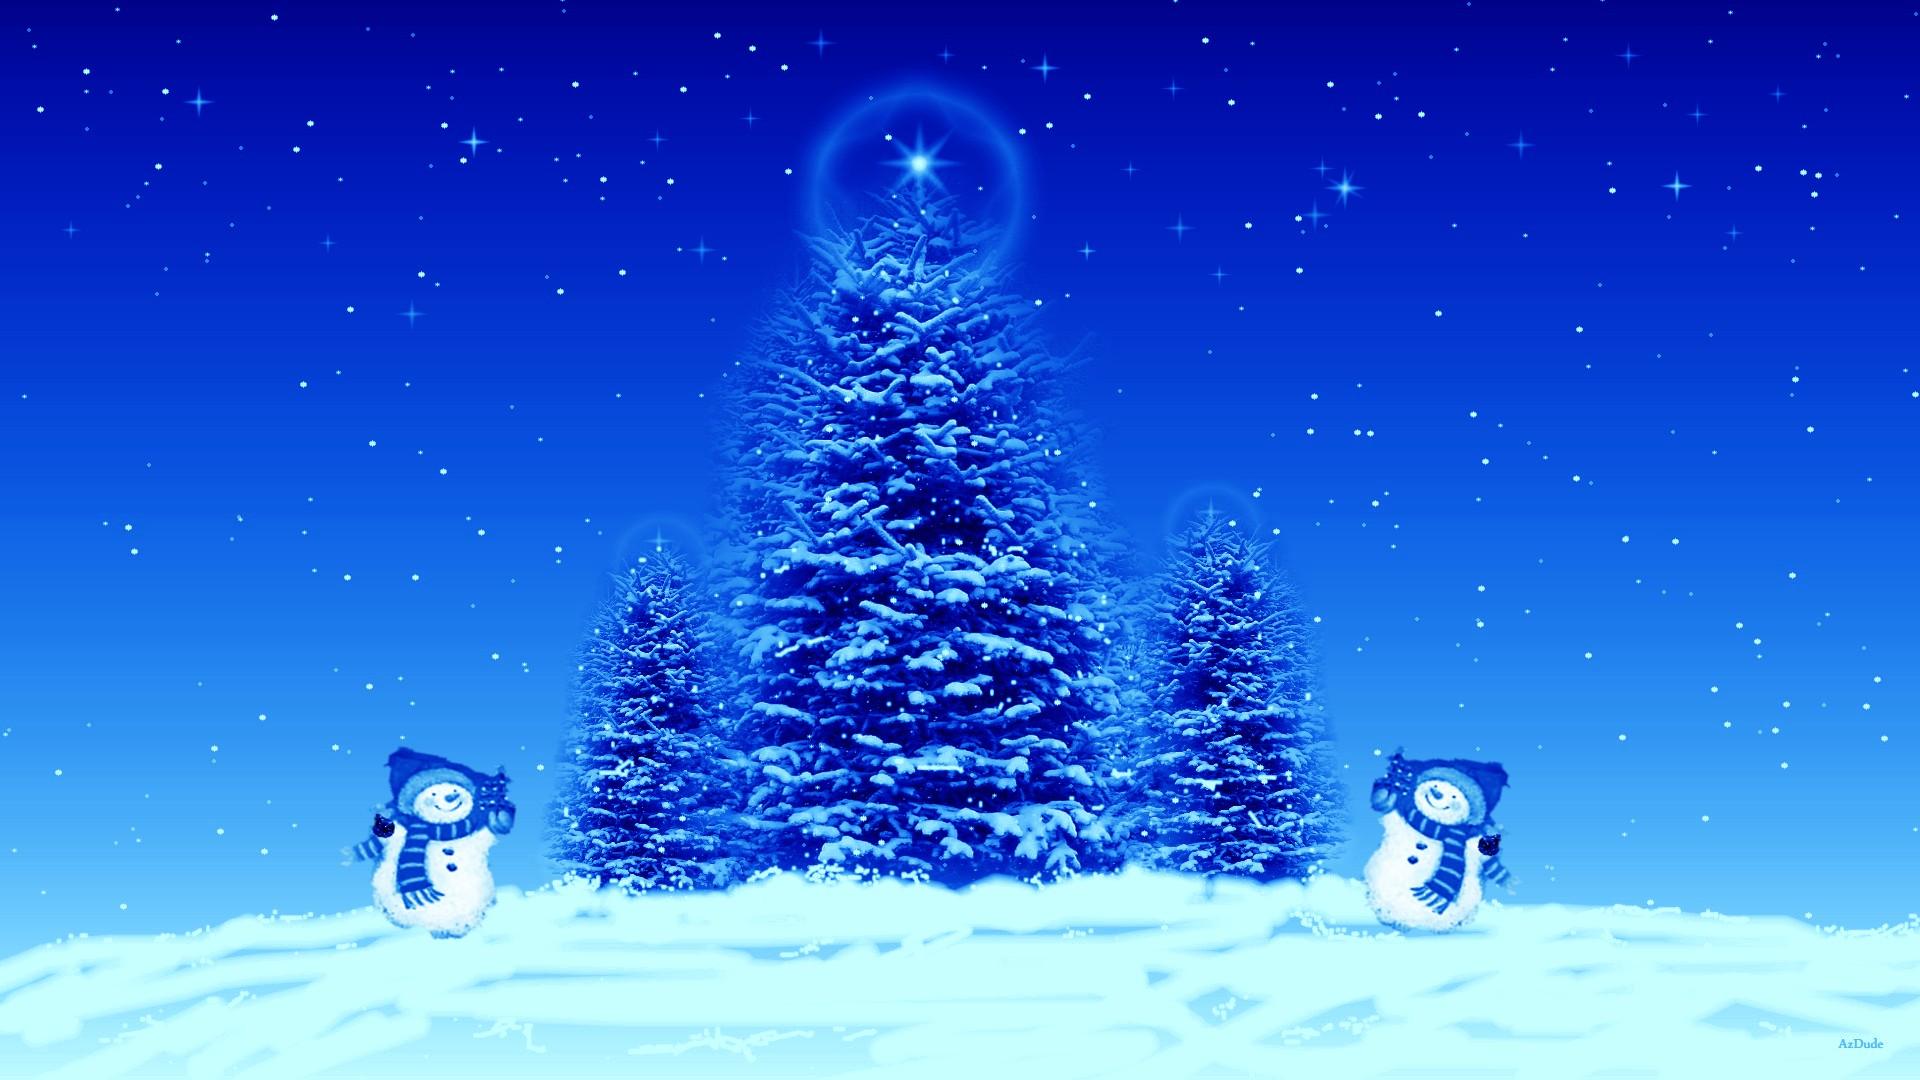 Christmas HD Wallpaper Background Image 1920x1080 ID